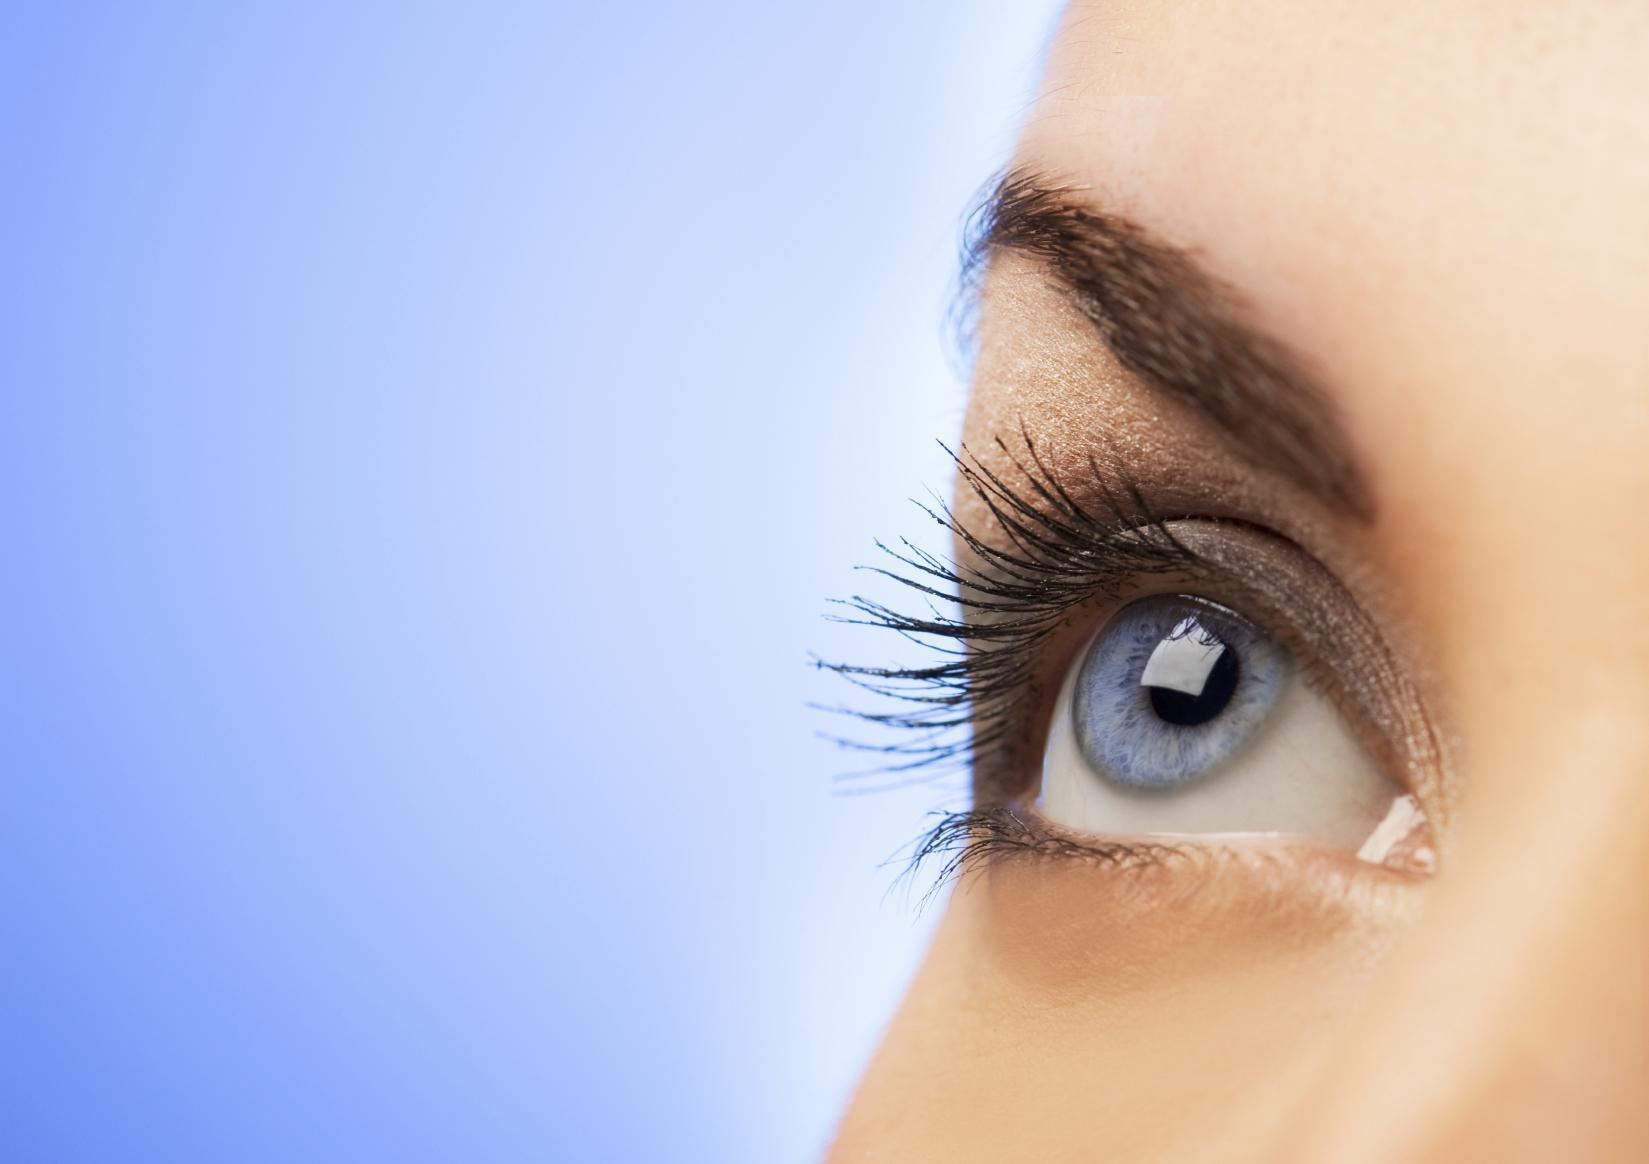 Cuidados Básicos Para a Higiene dos Olhos